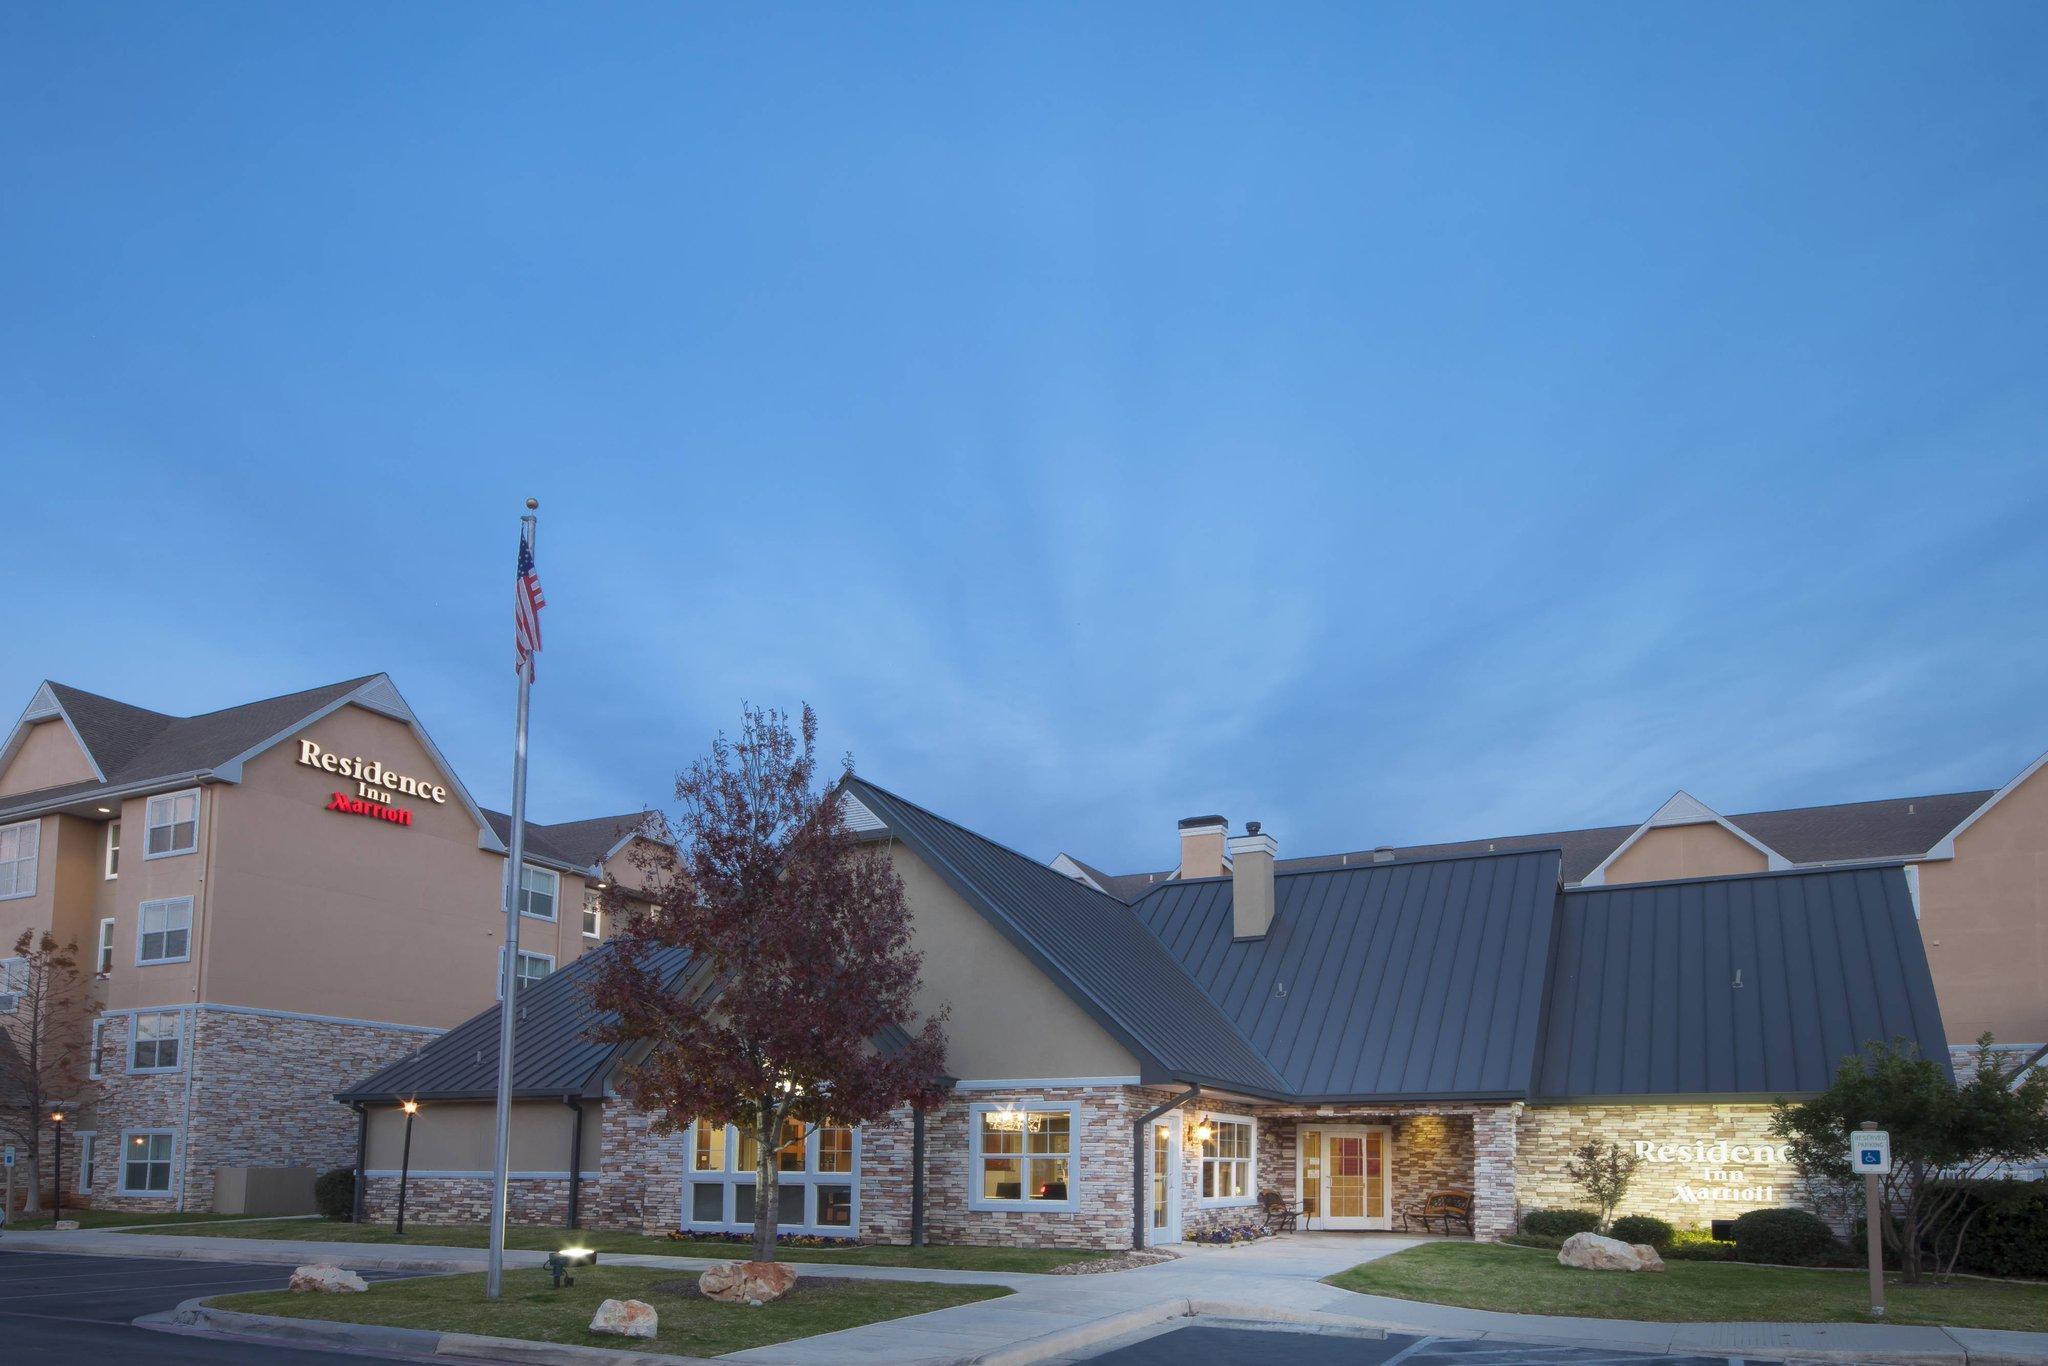 Residence Inn San Antonio North Stone Oak